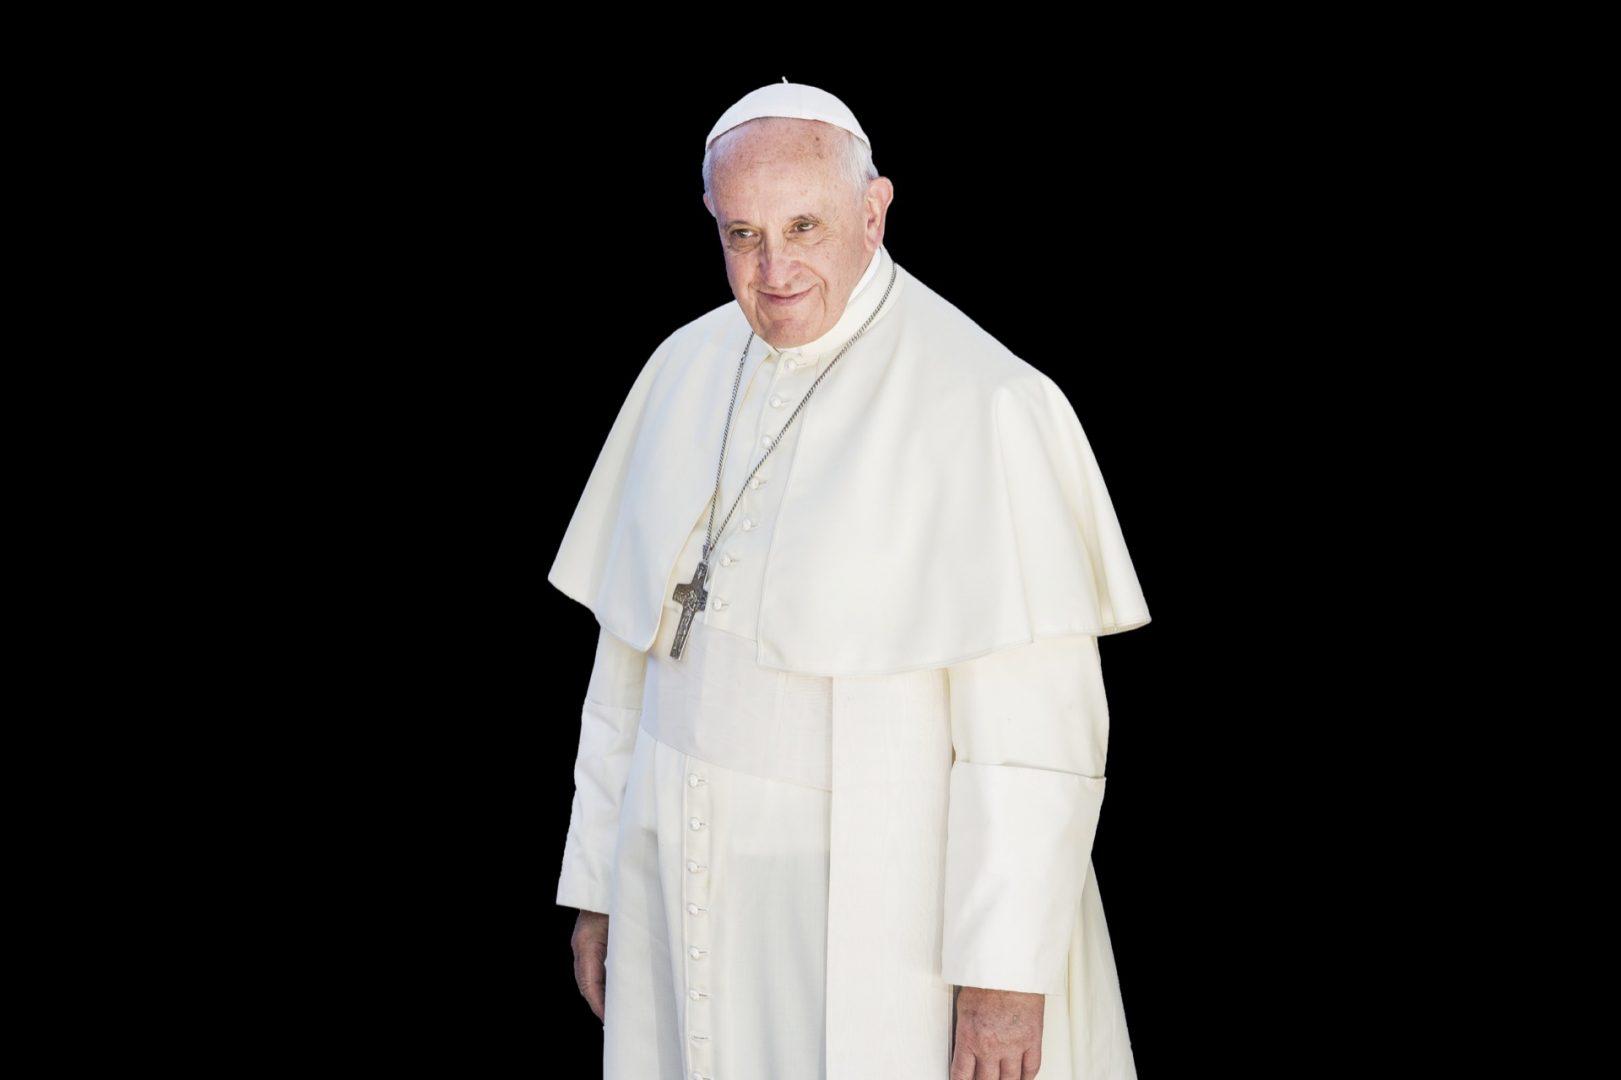 Florentin Papst